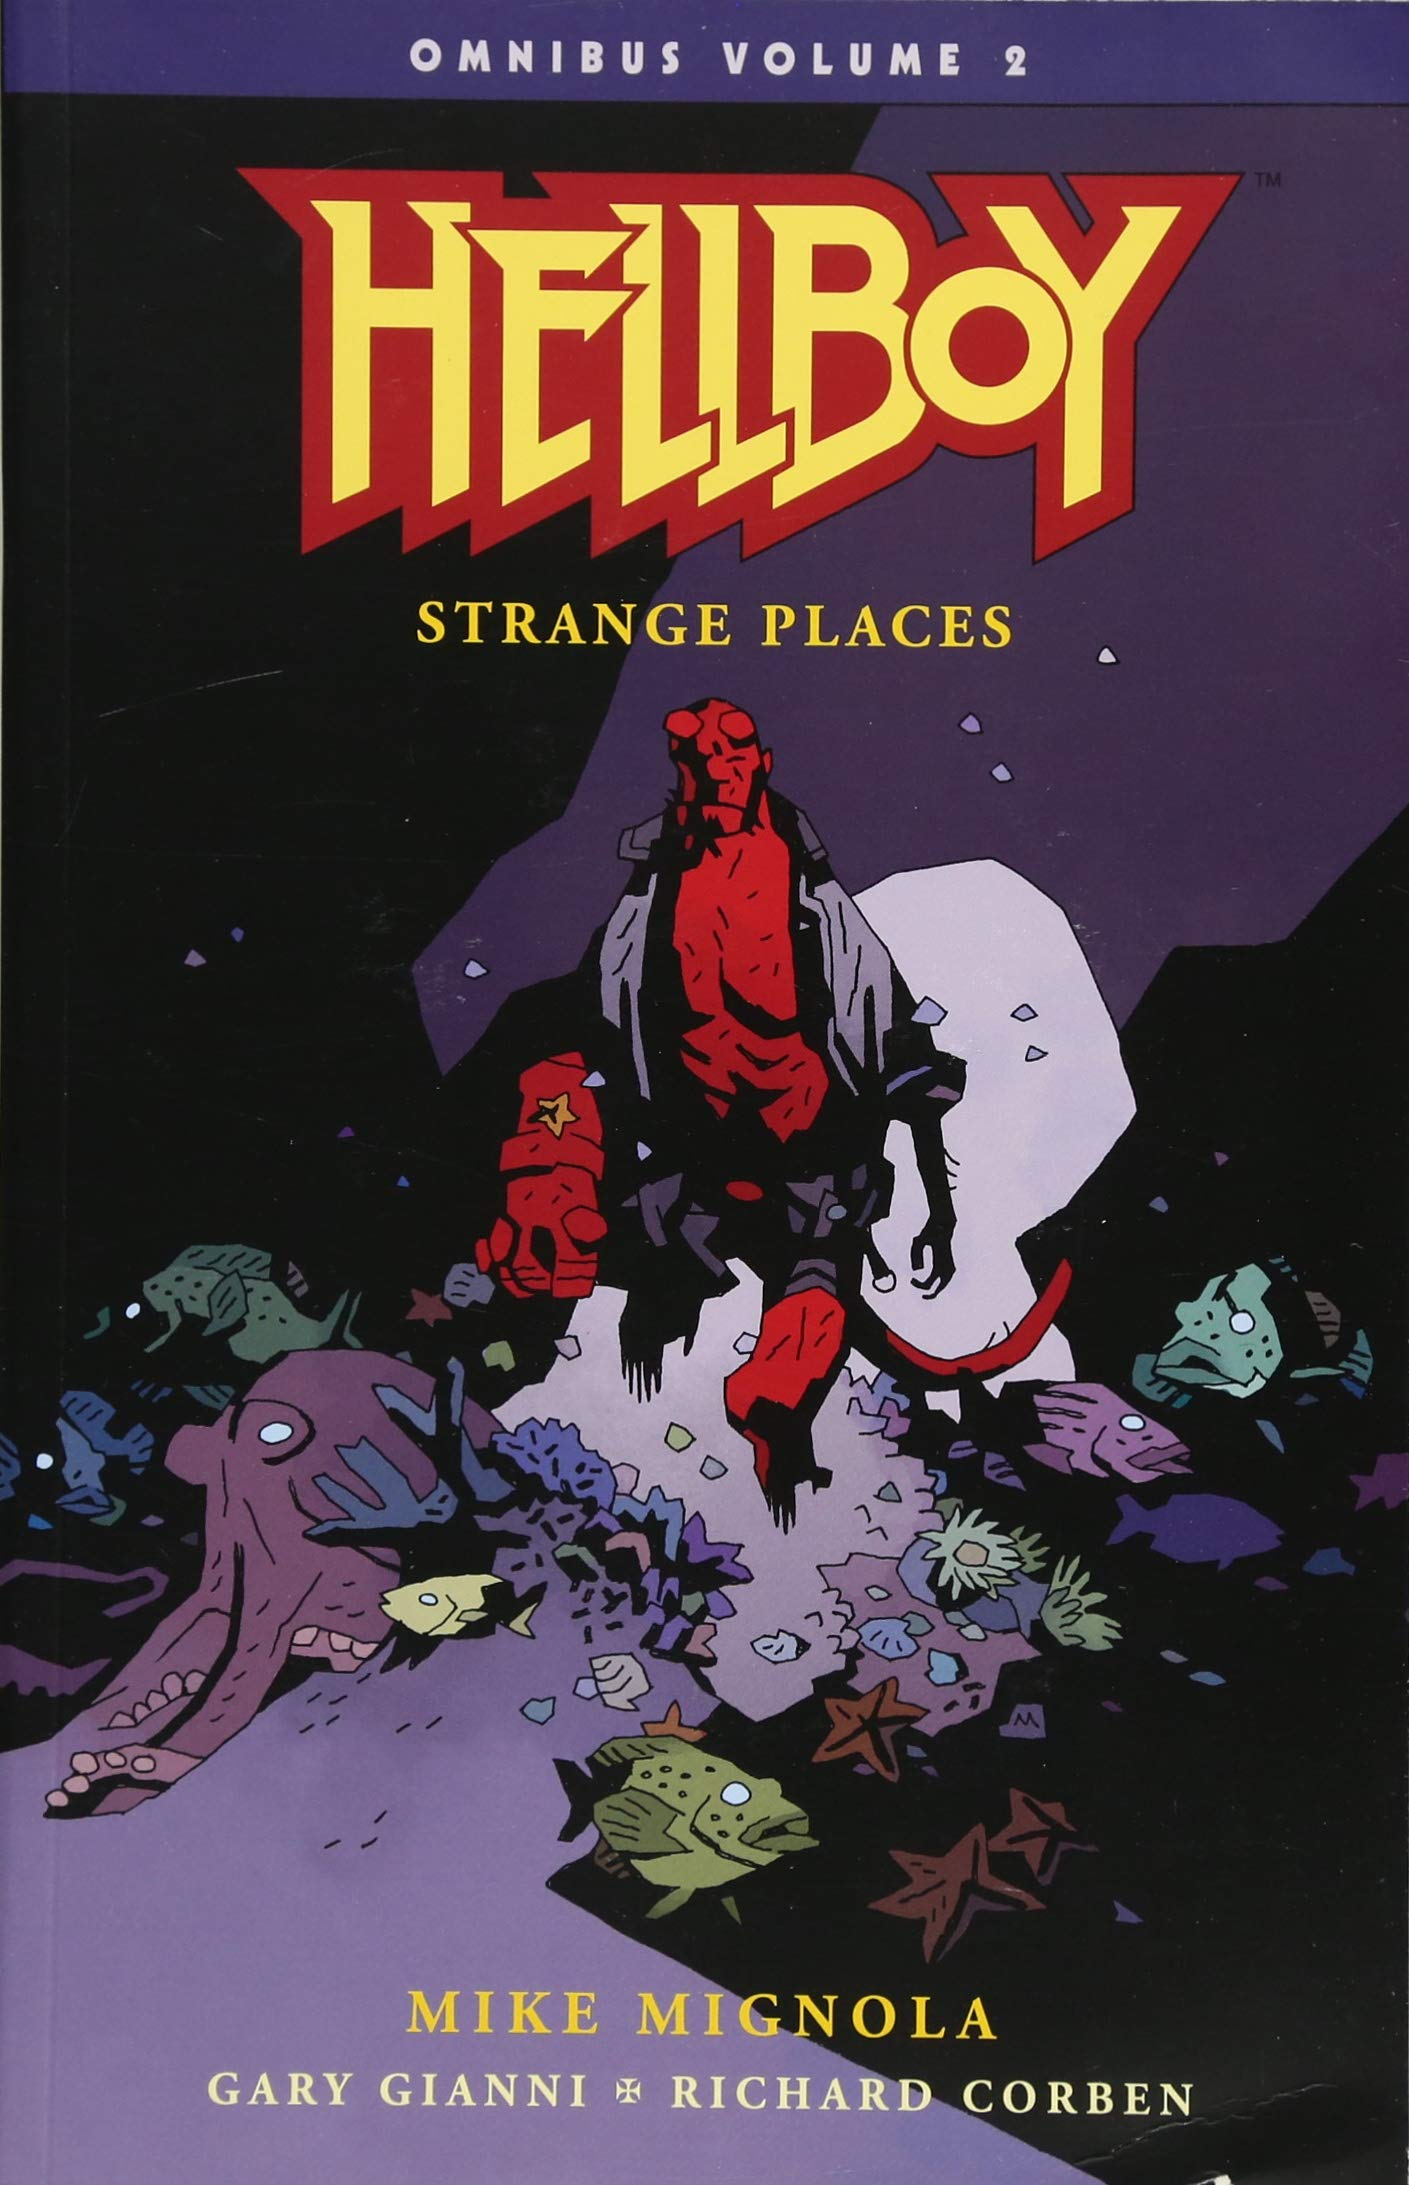 Hellboy Omnibus Volume 2: Strange Places (Hellboy Omnibus: Strange Places) ebook